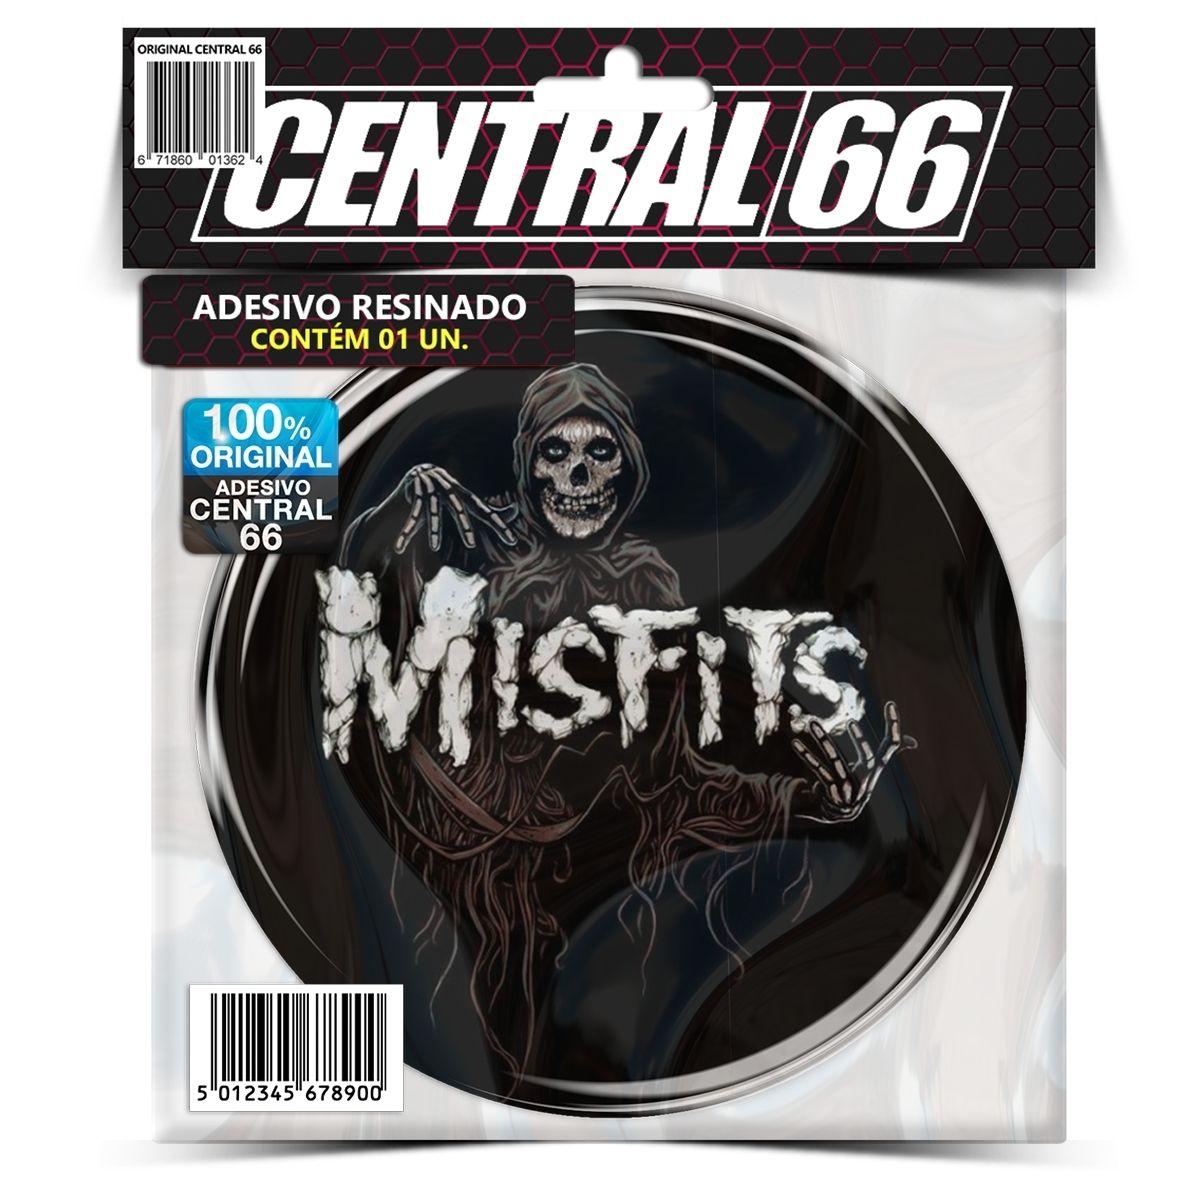 Adesivo Redondo Misfits M03 – Central 66